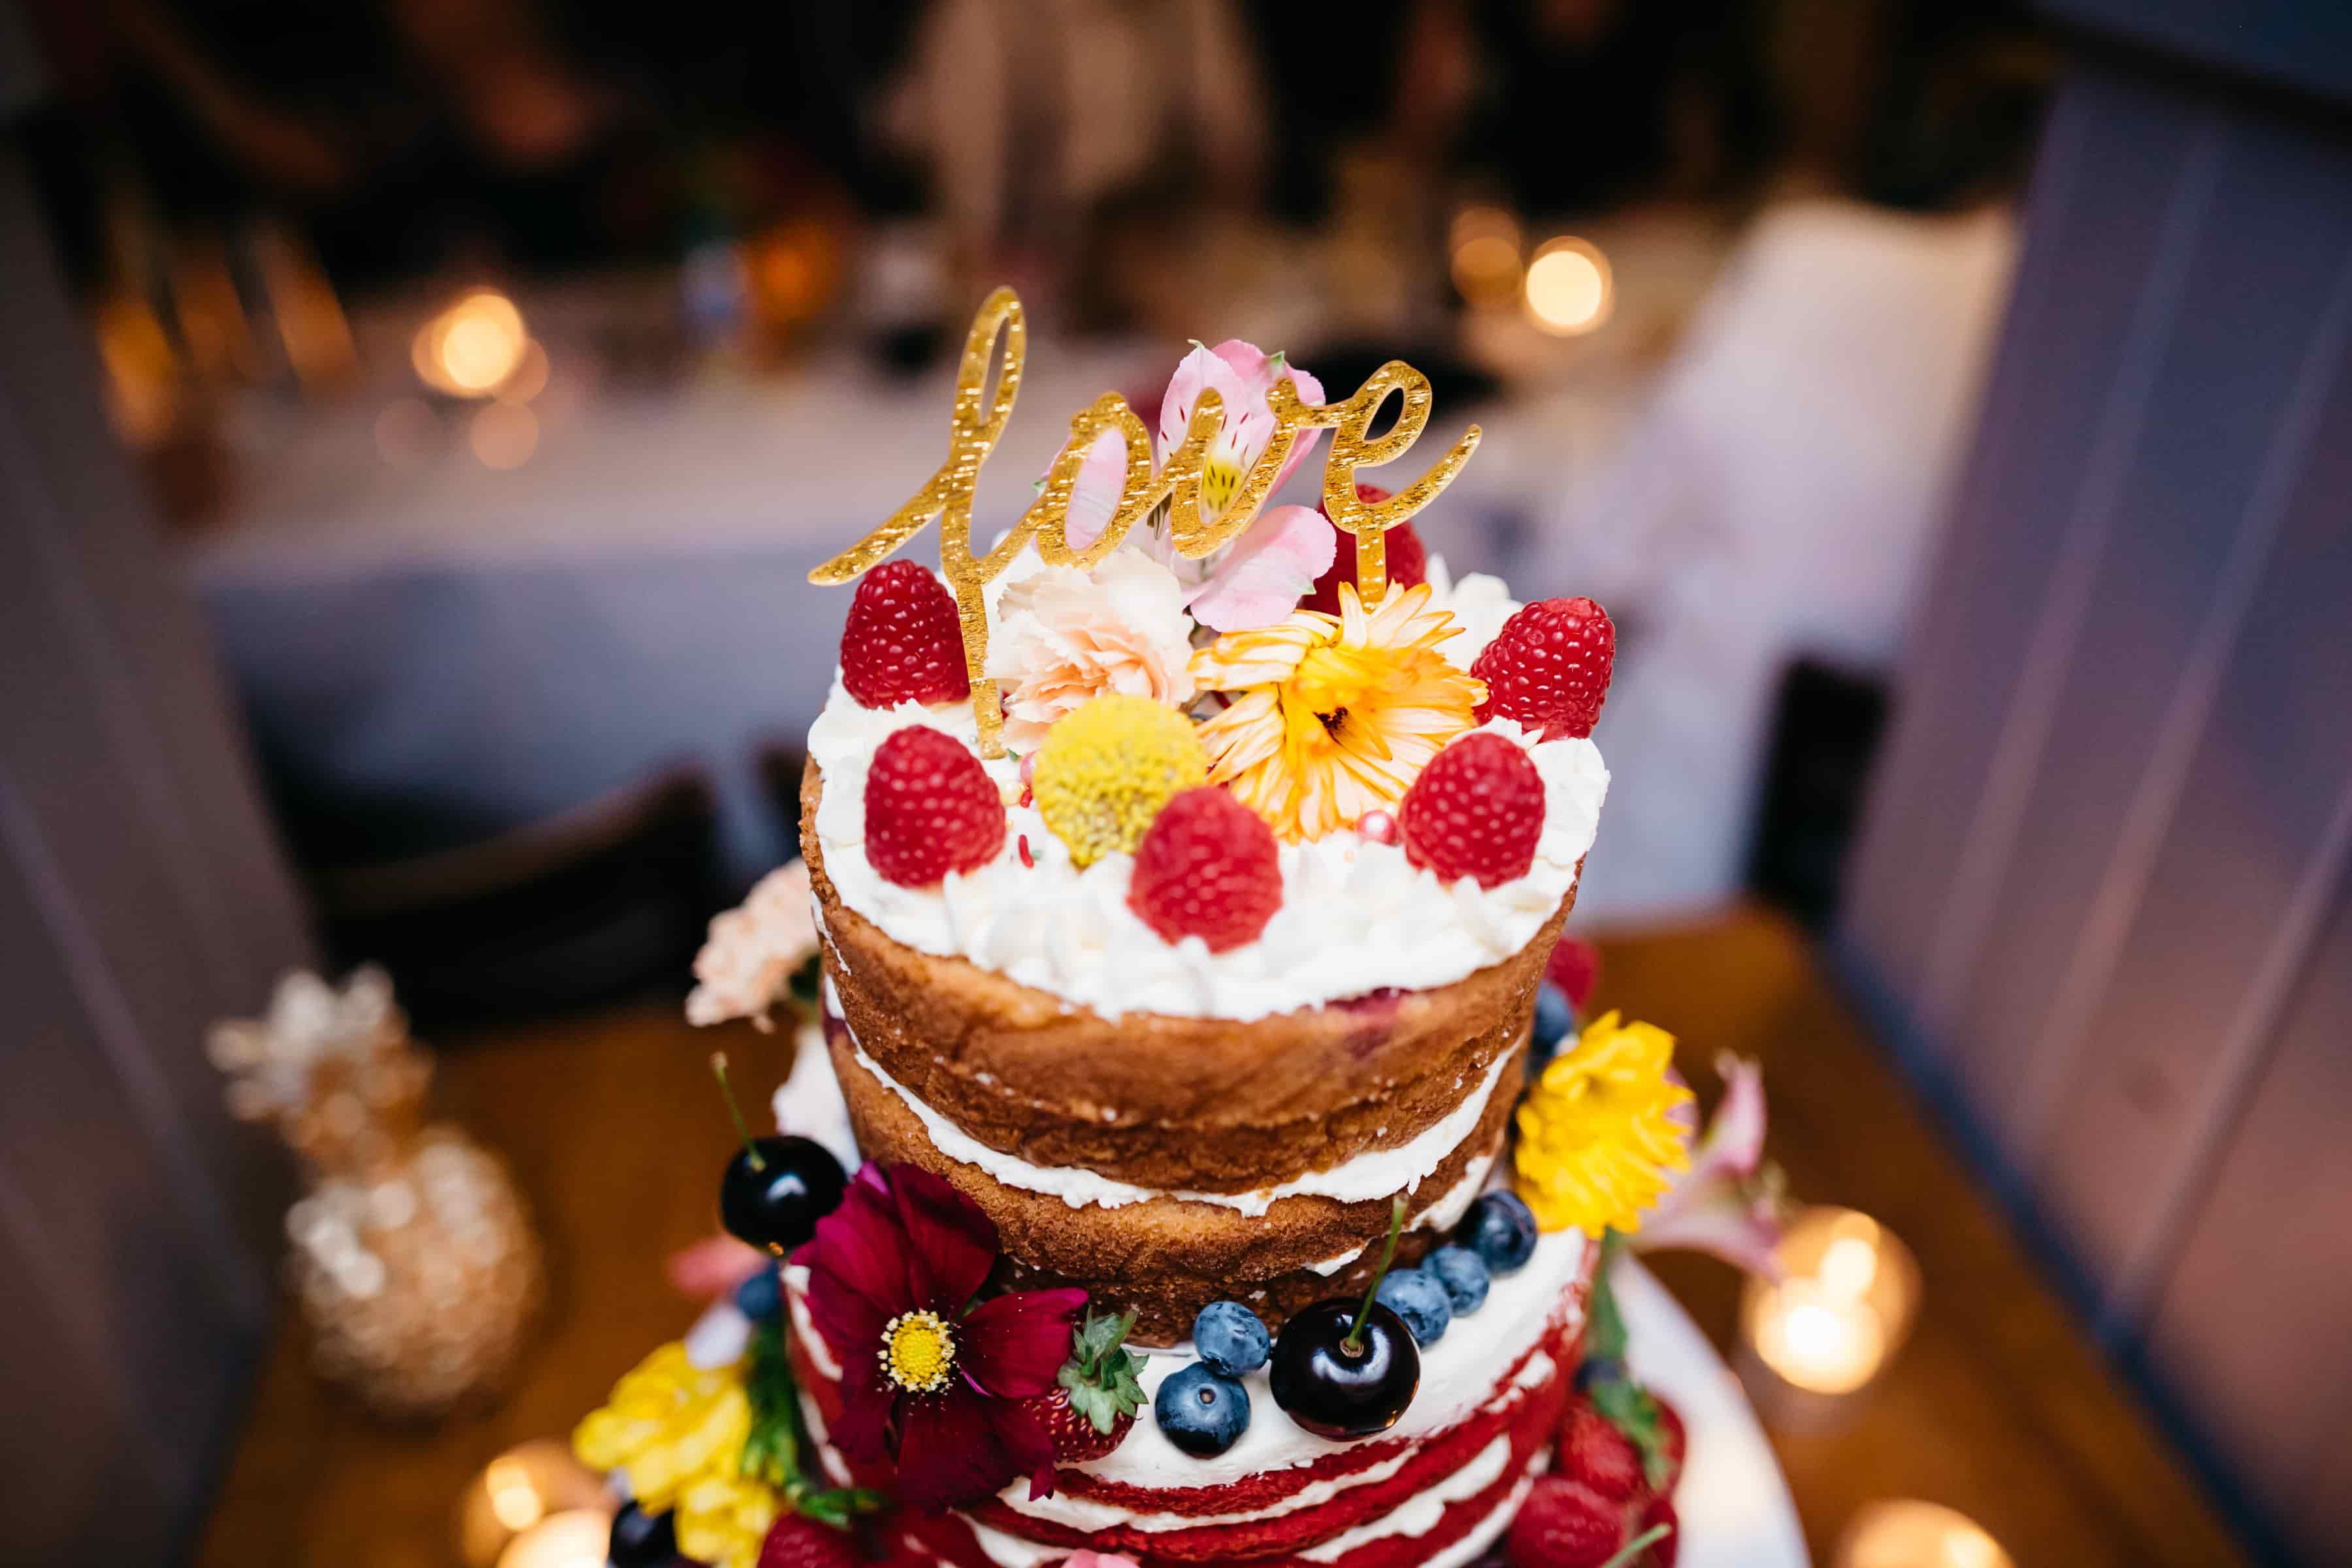 honeycomb cakes brighton, wedding cake